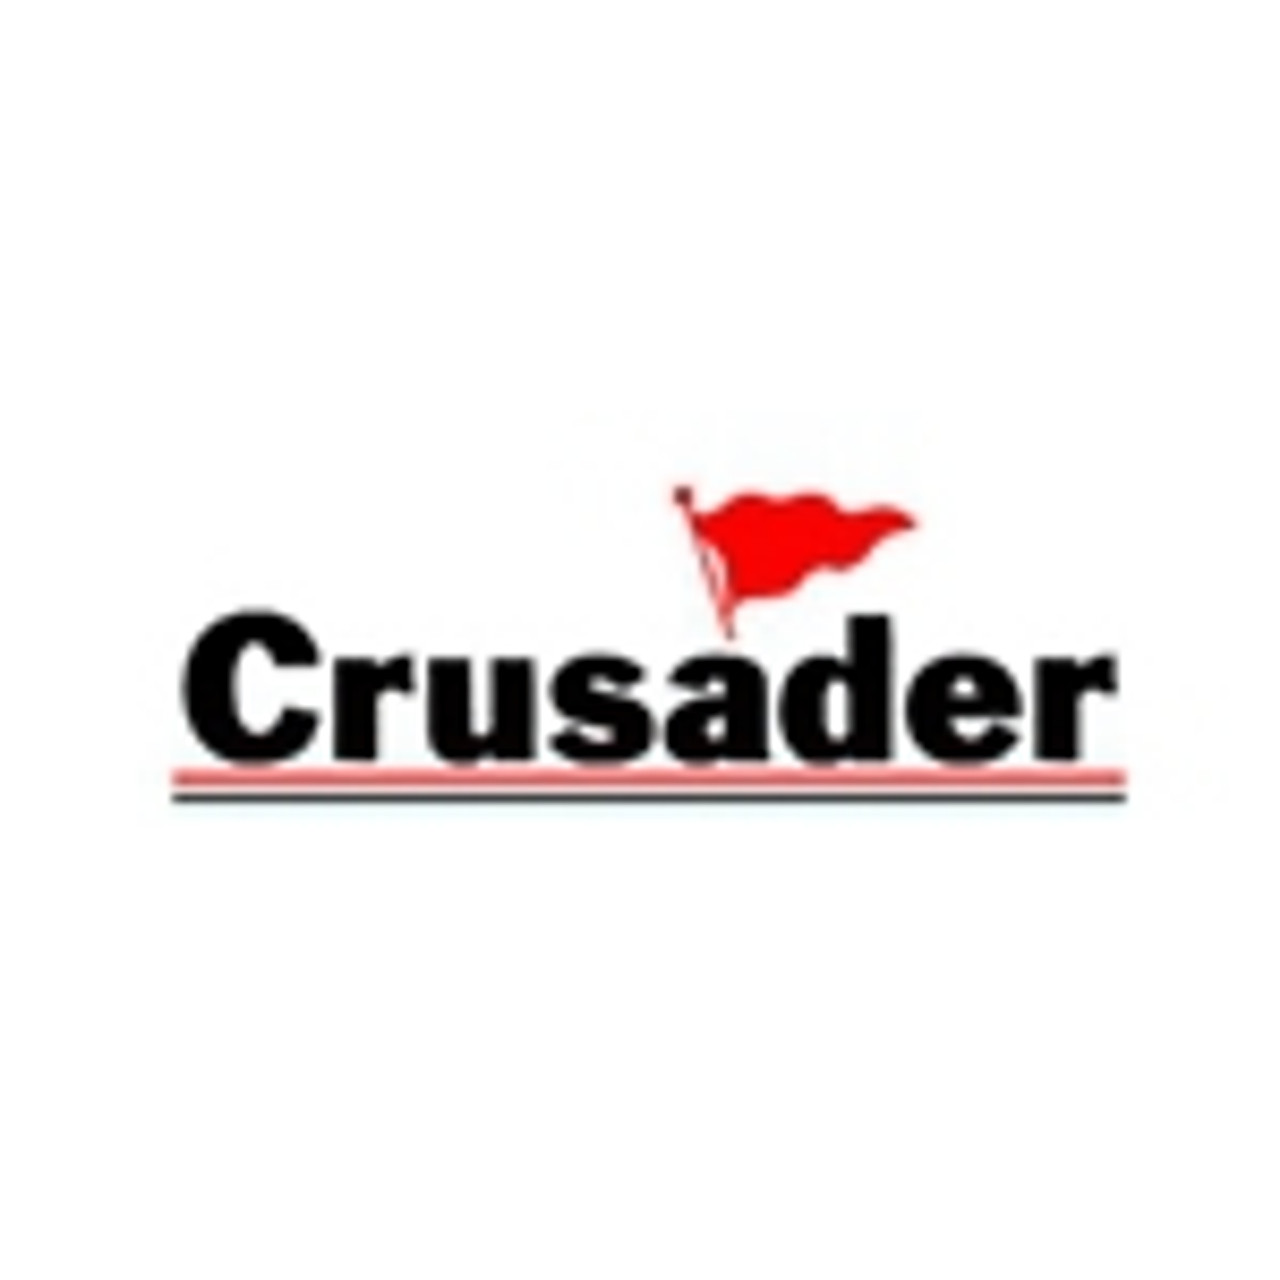 Crusader Marine